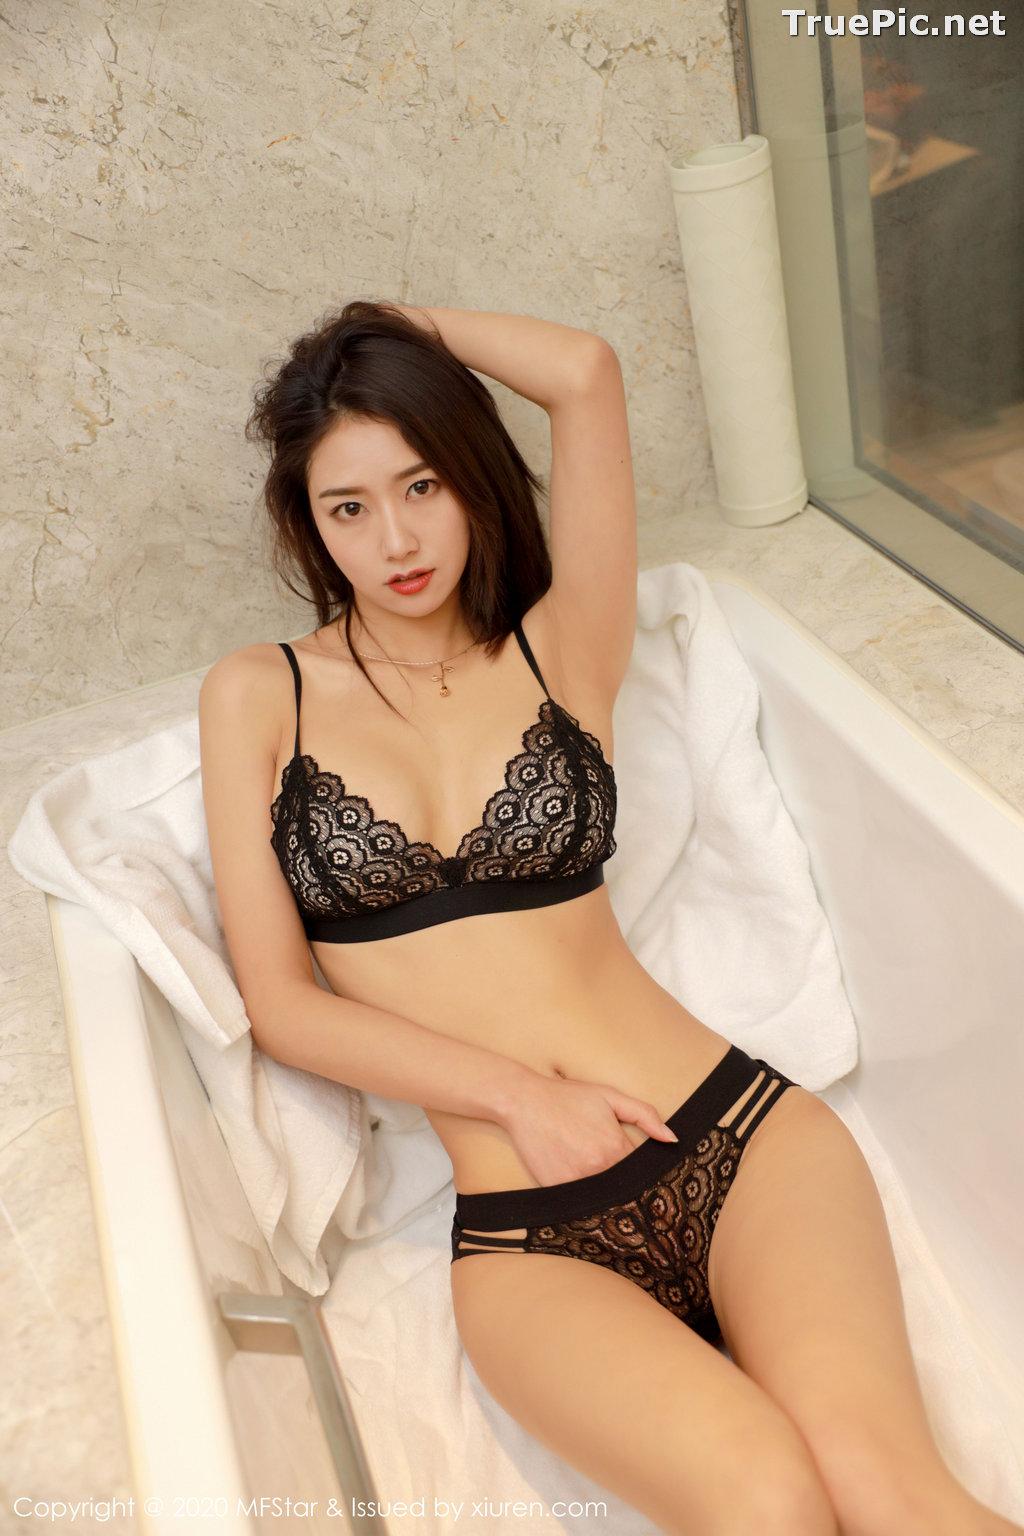 Image MFStar Vol.307 - Chinese Model - Fang Zi Xuan (方子萱) - TruePic.net - Picture-7